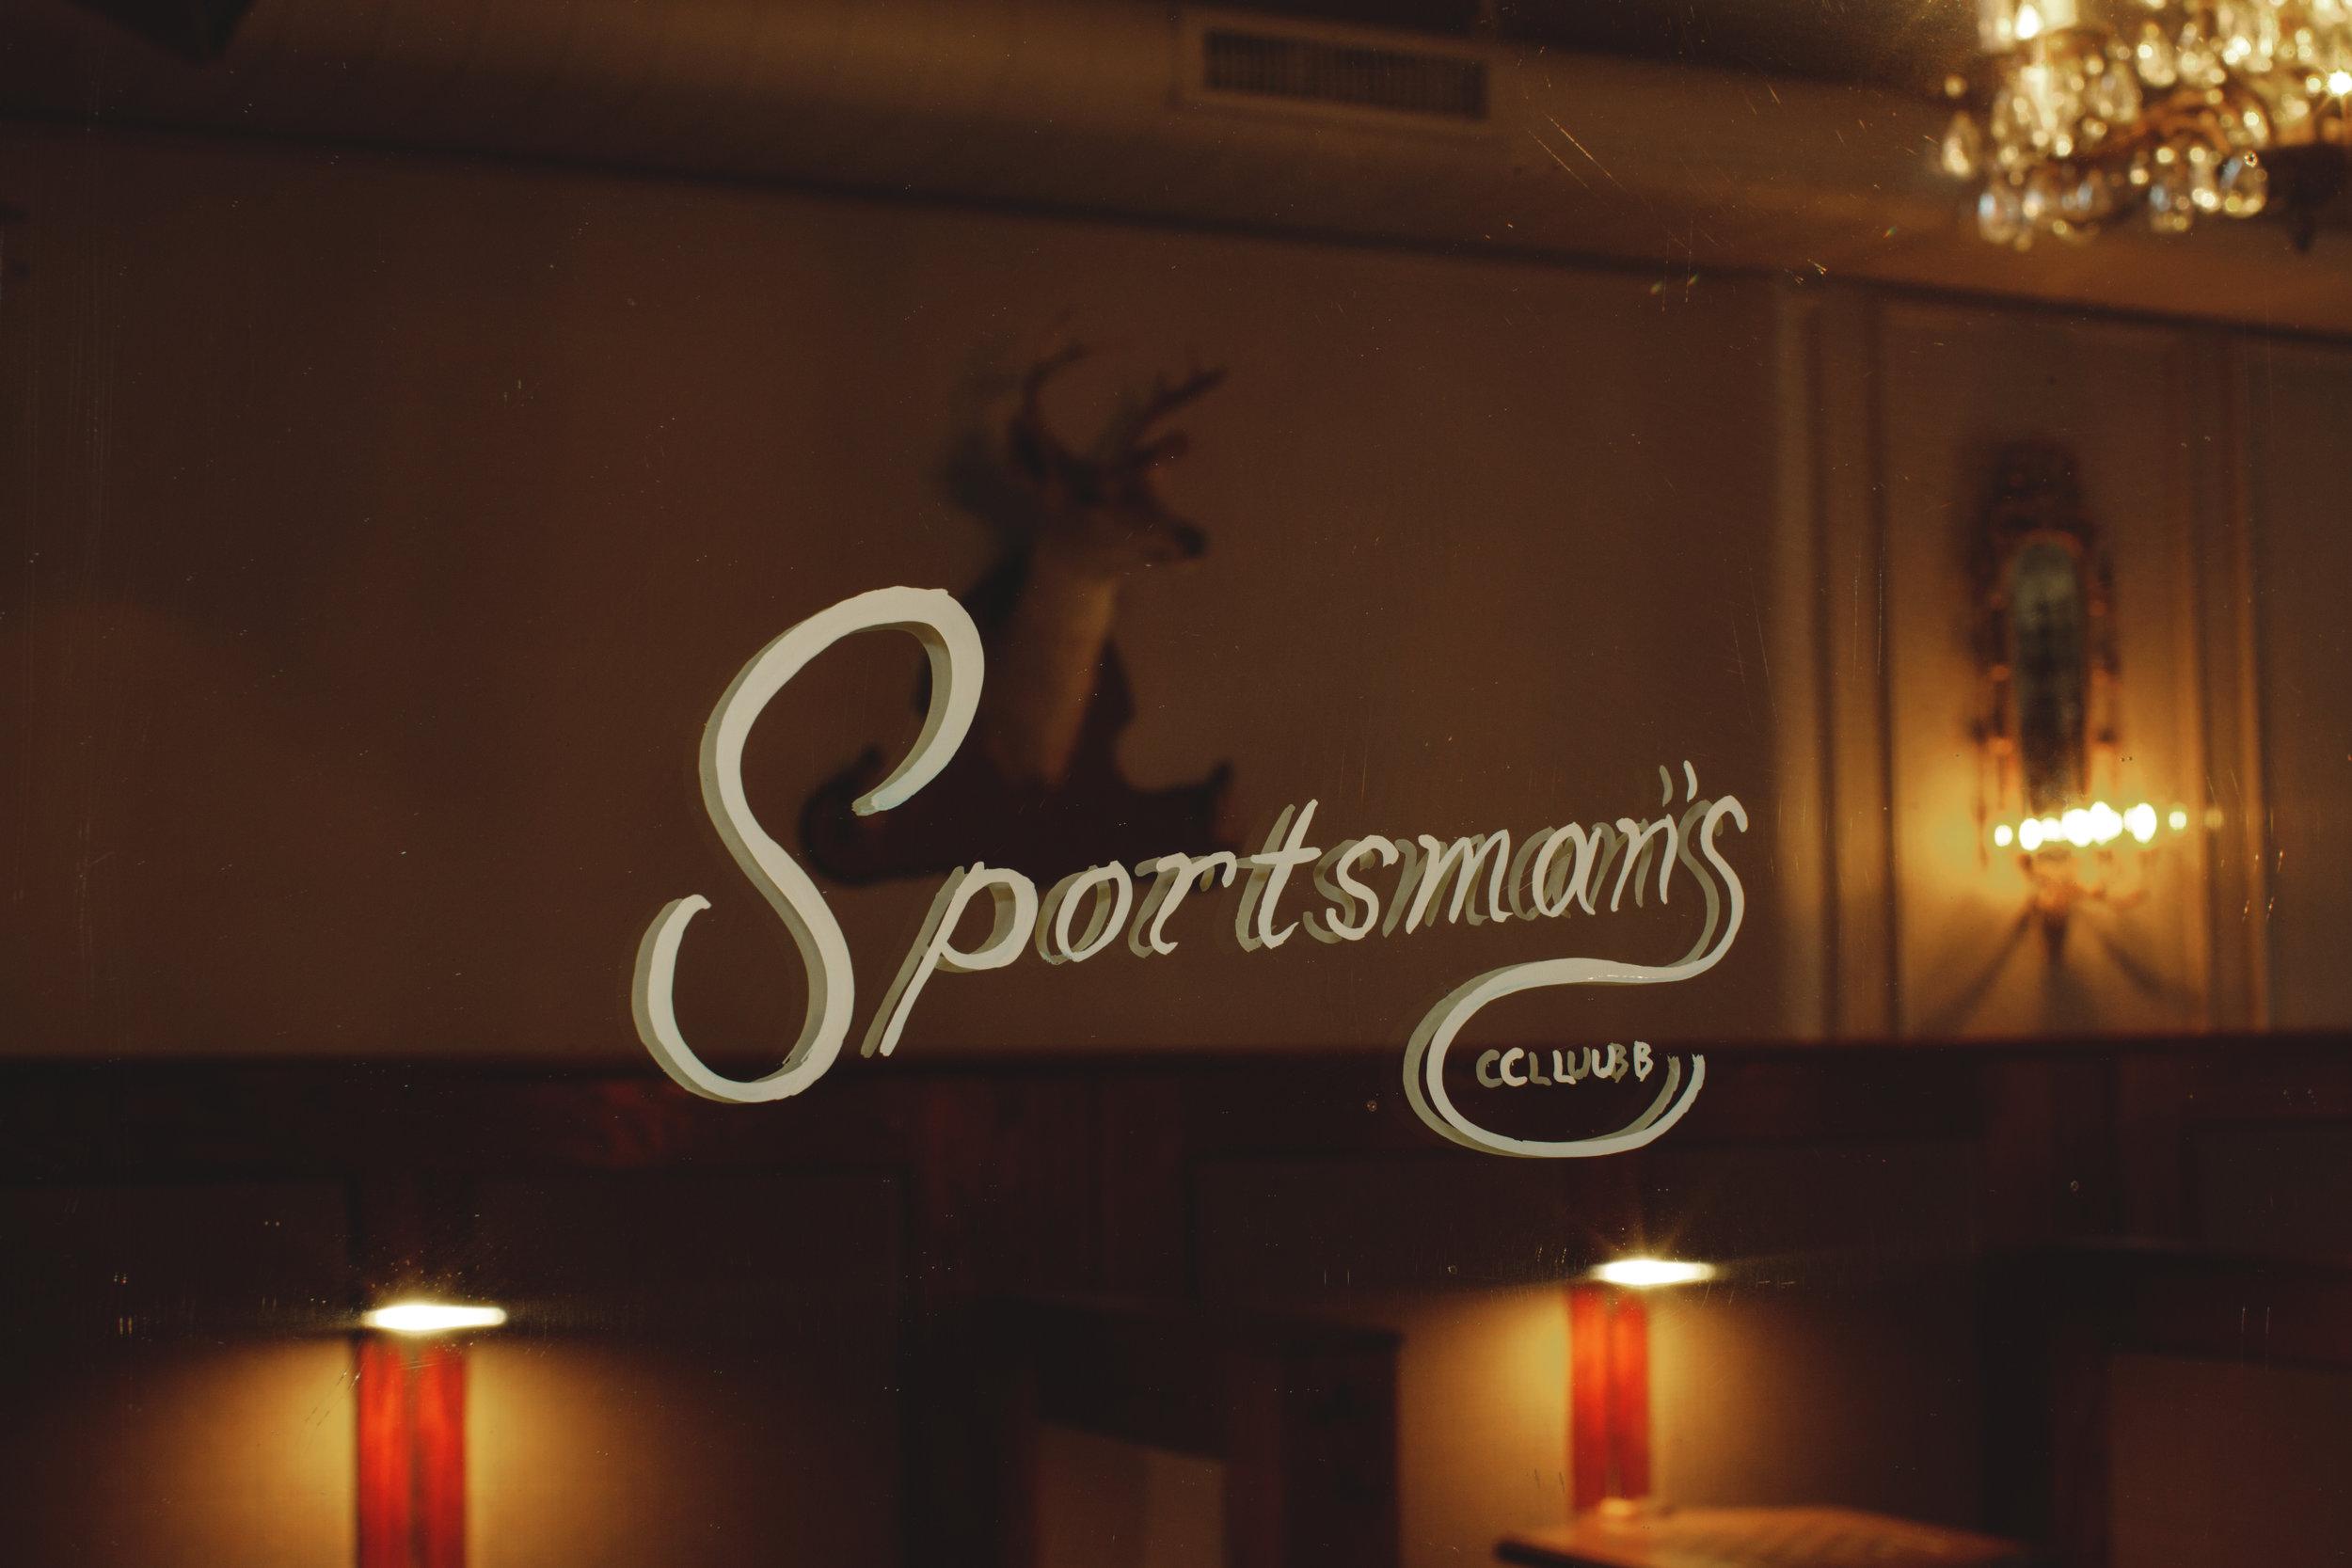 028 Sportsmans Club.jpg